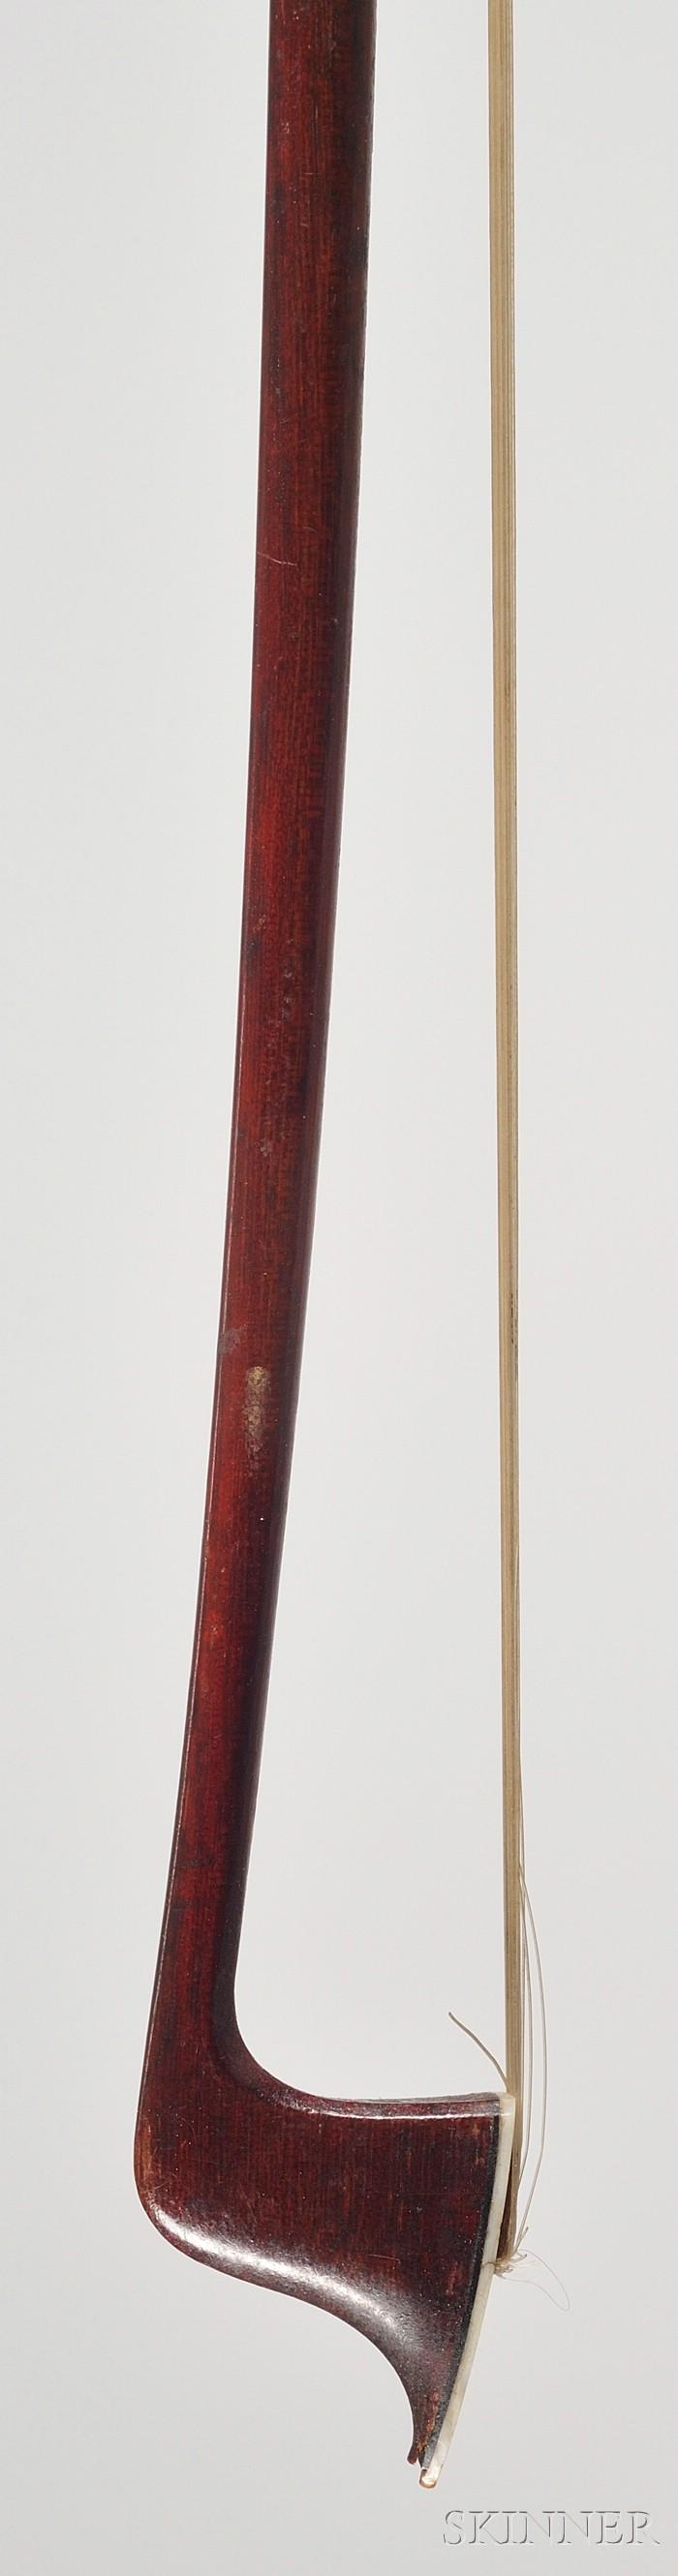 Nickel Mounted Violin Bow